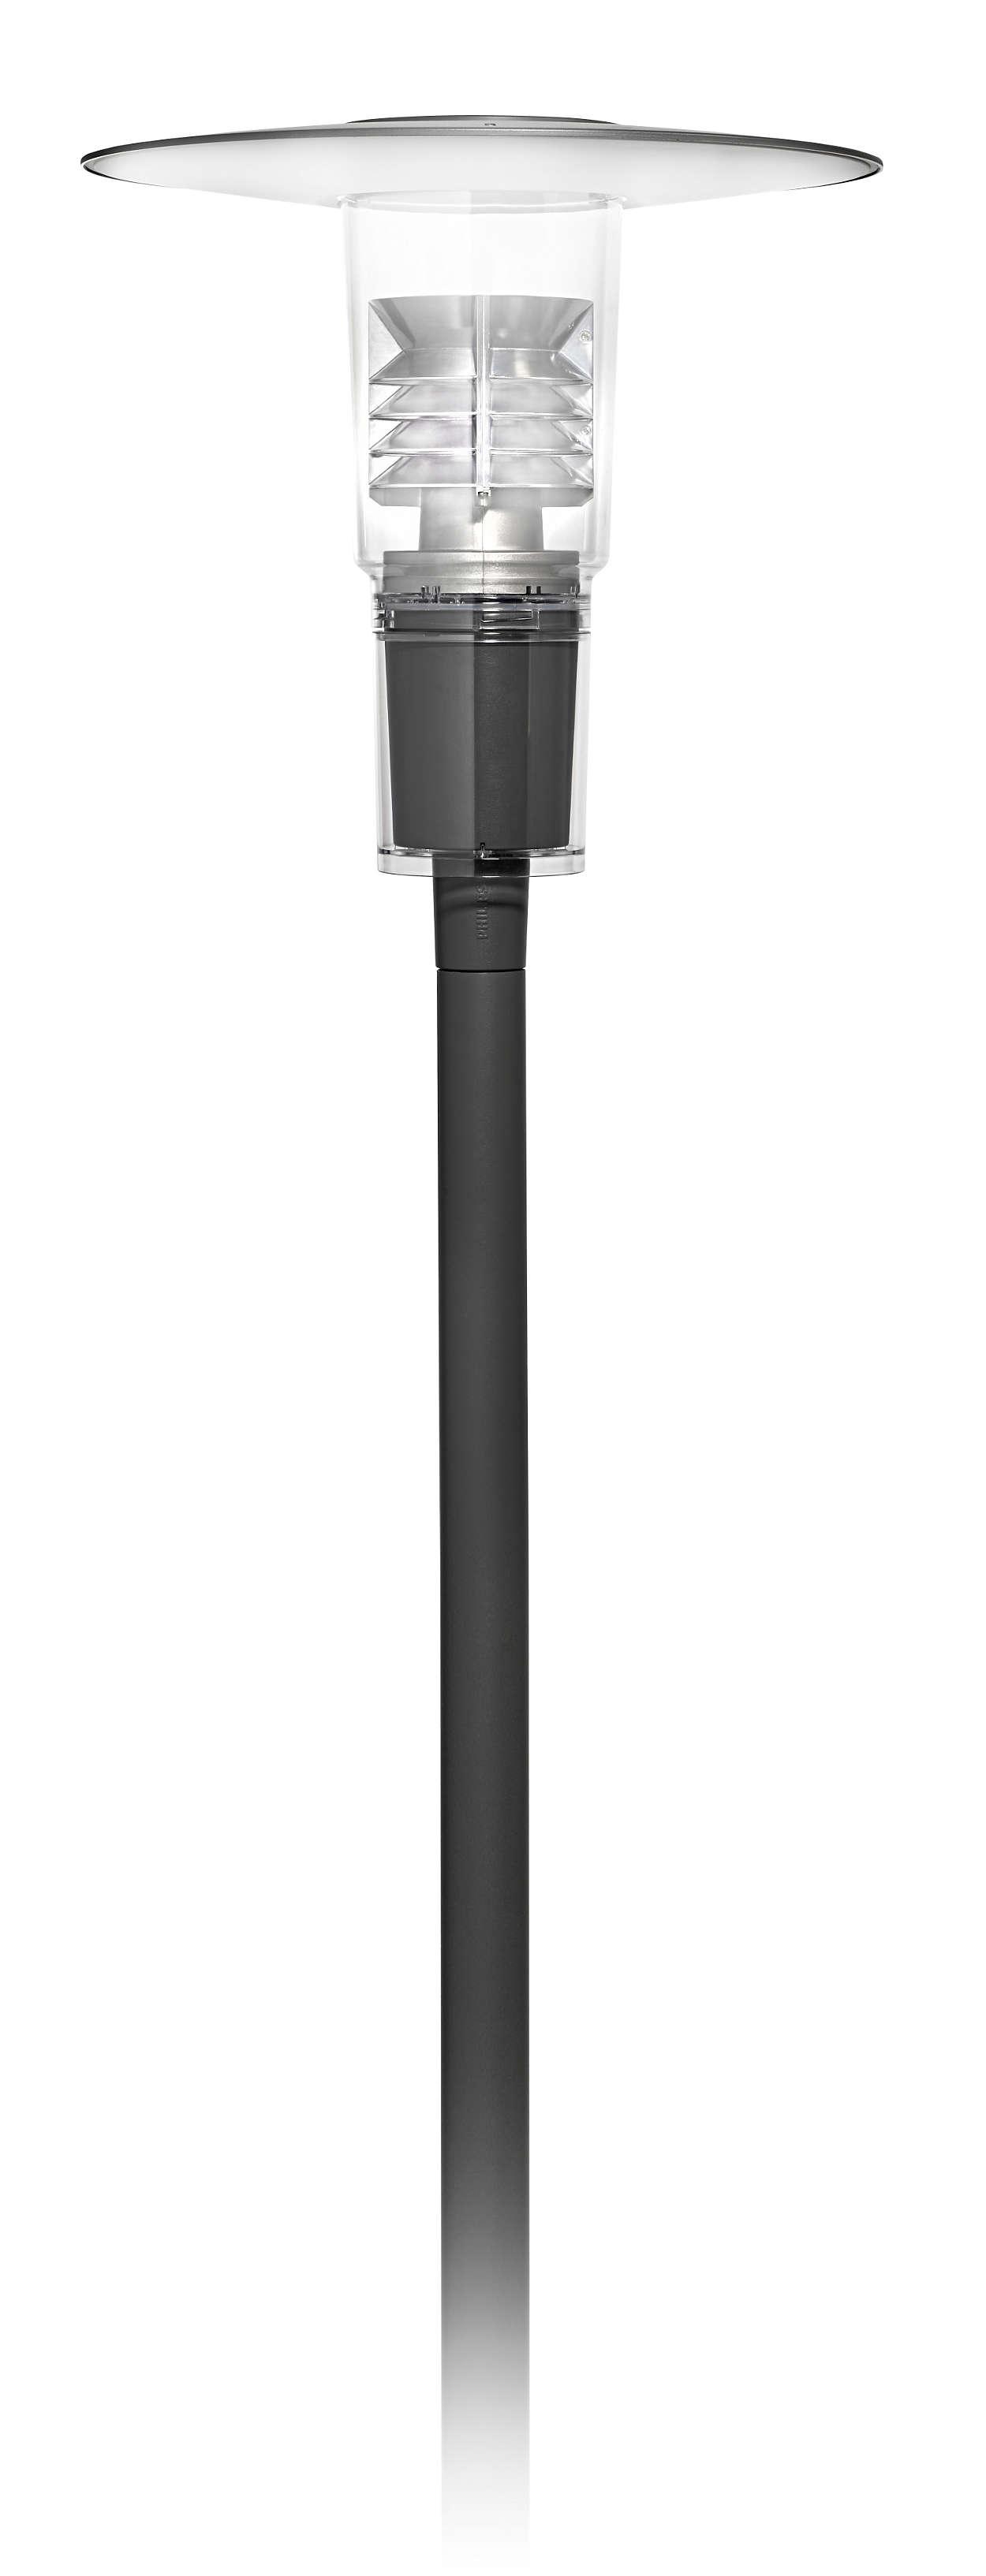 CitySpirit² Réflecteur Moderne